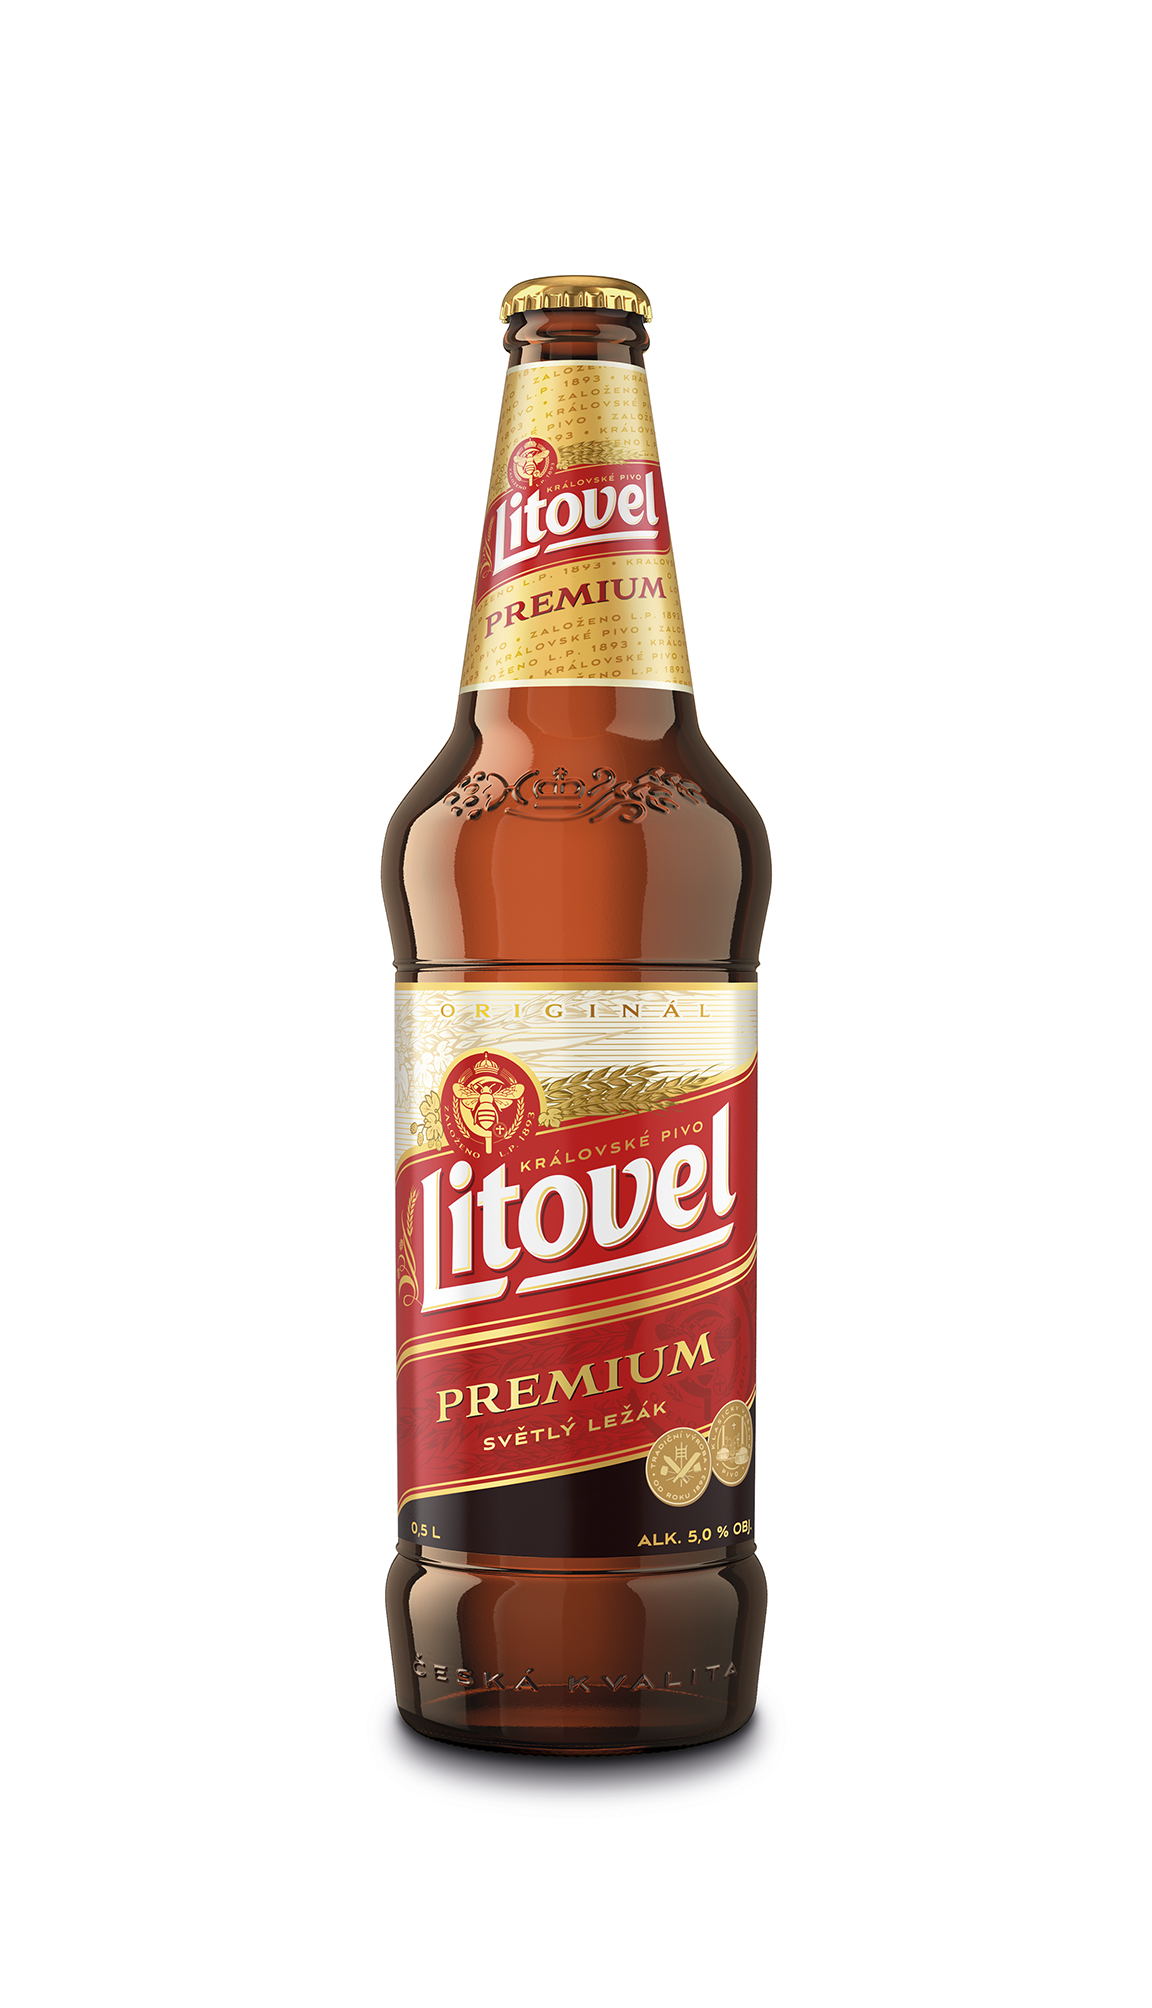 Litovel modernizuje lahve – nový tvar umí zvýšit kvalitu piva